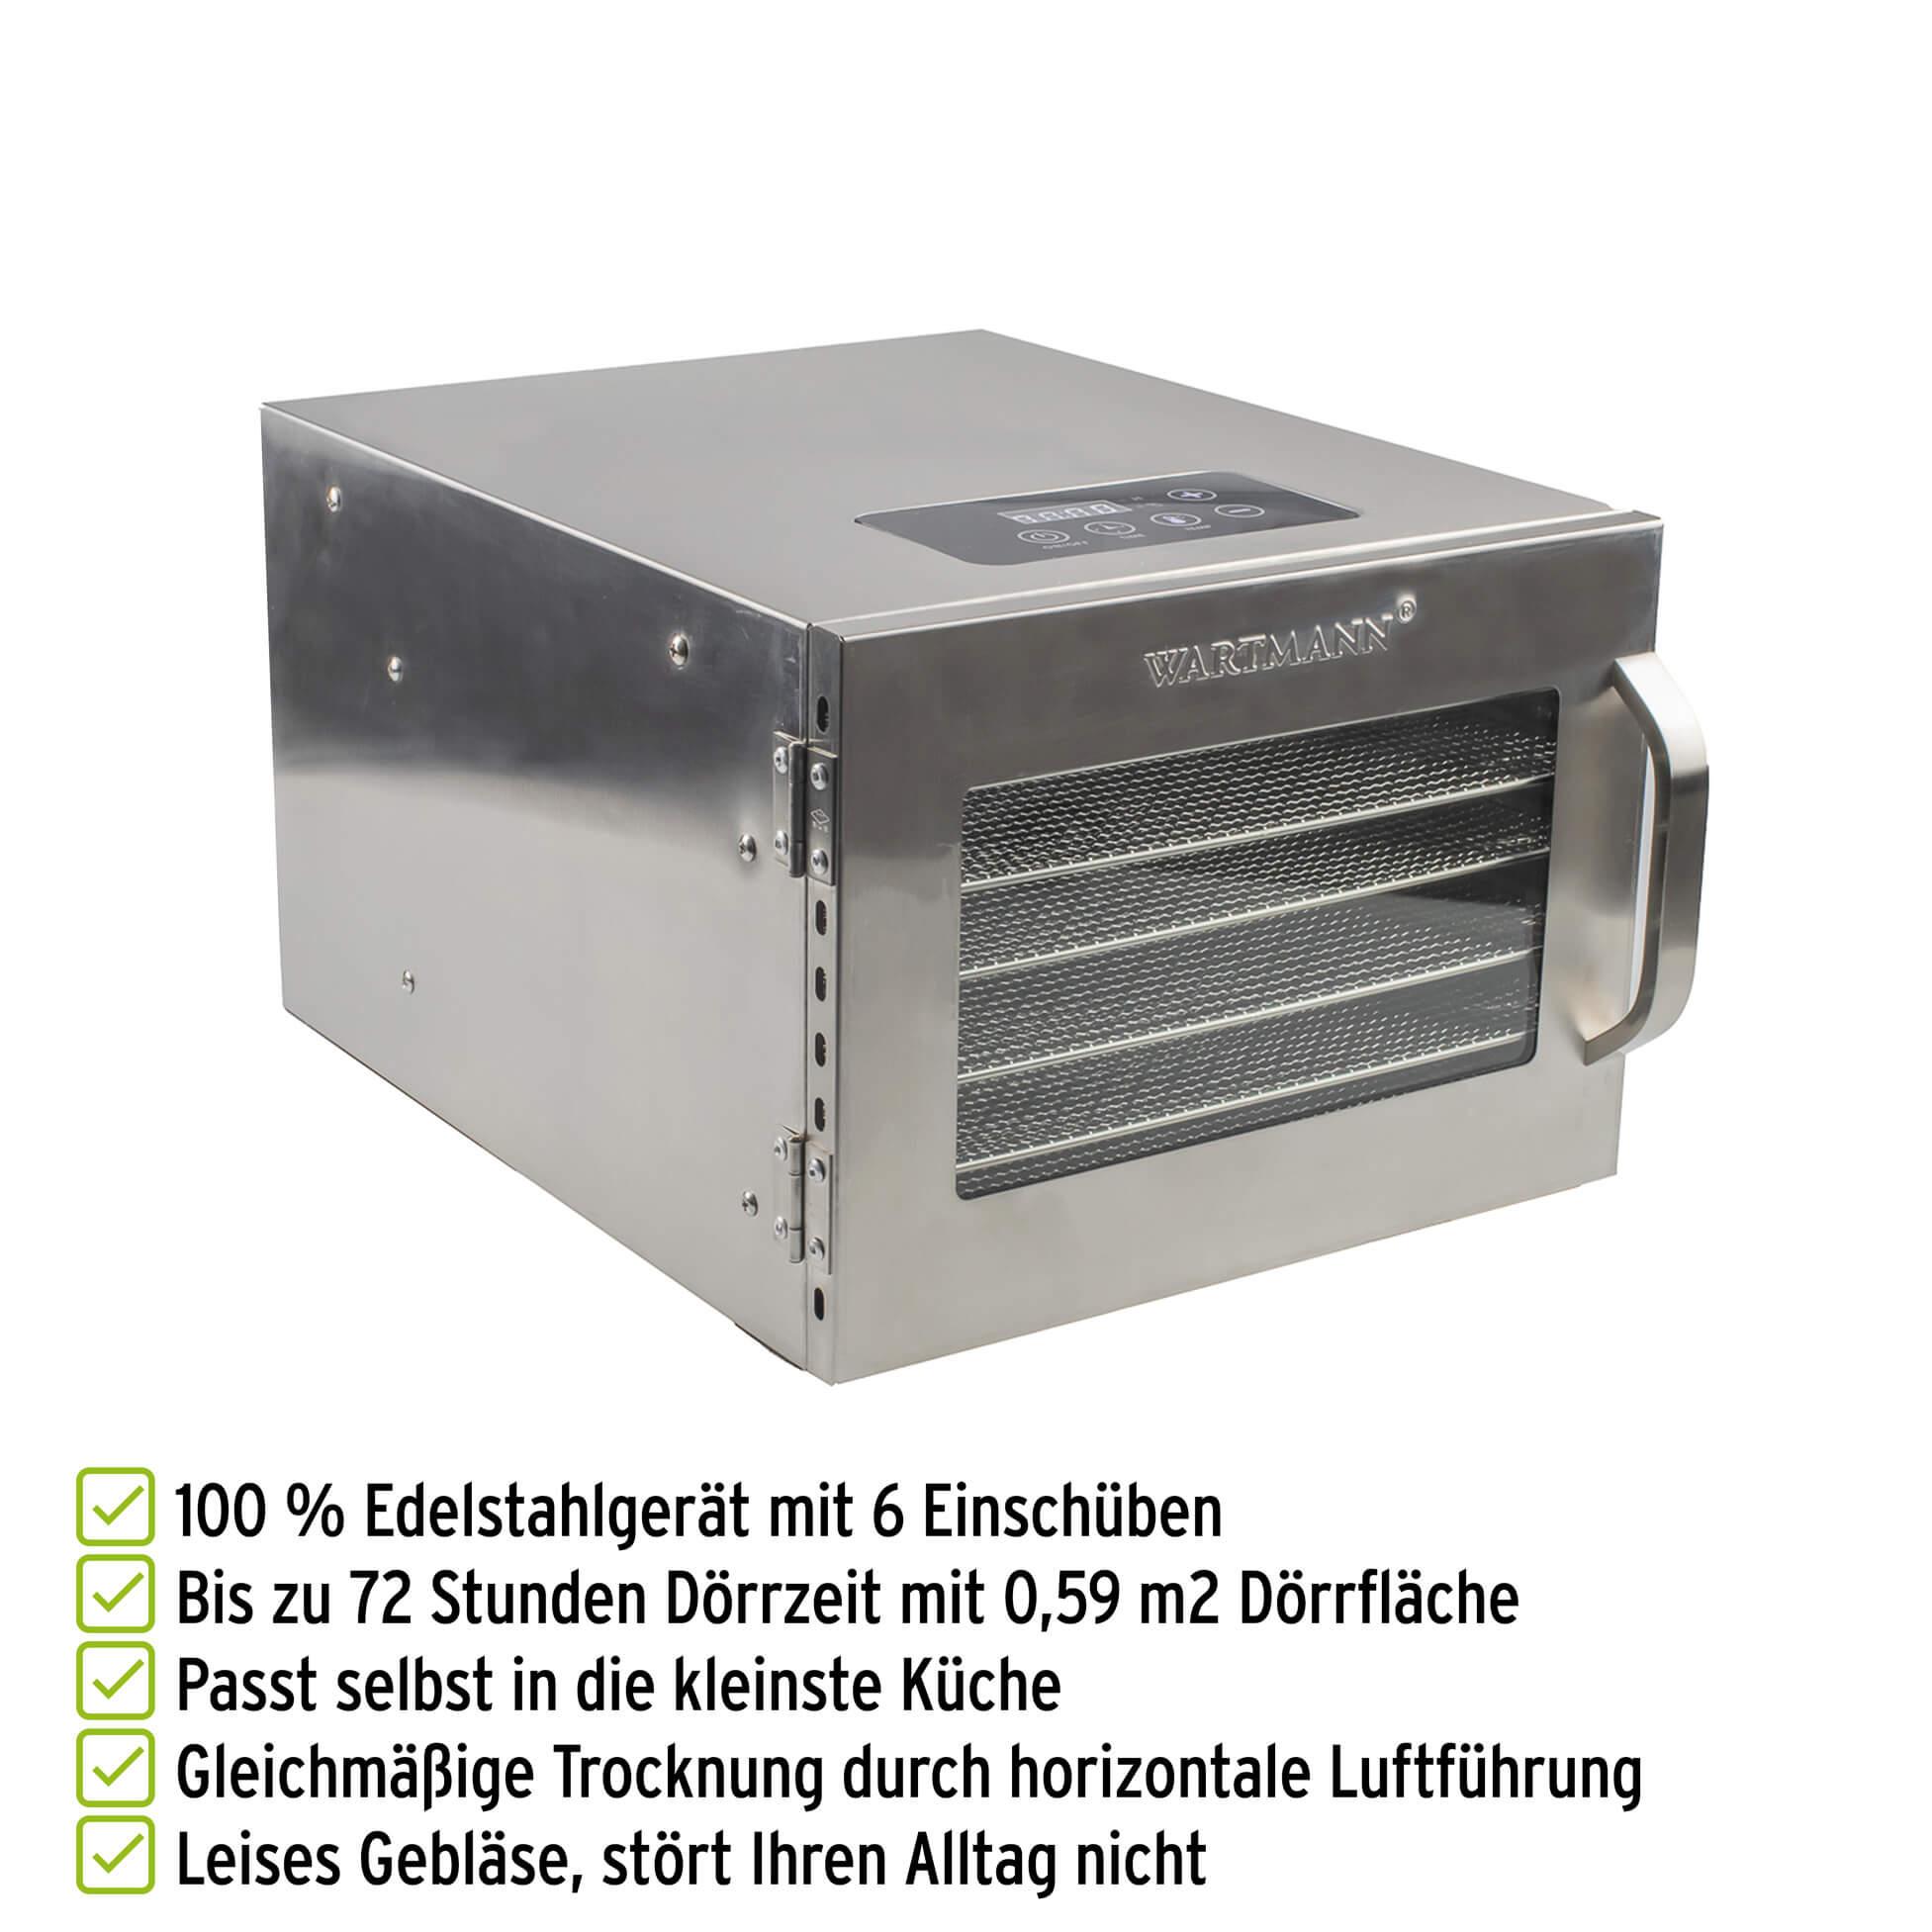 Wartmann Edelstahl-Dörrautomat WM-2006 DH